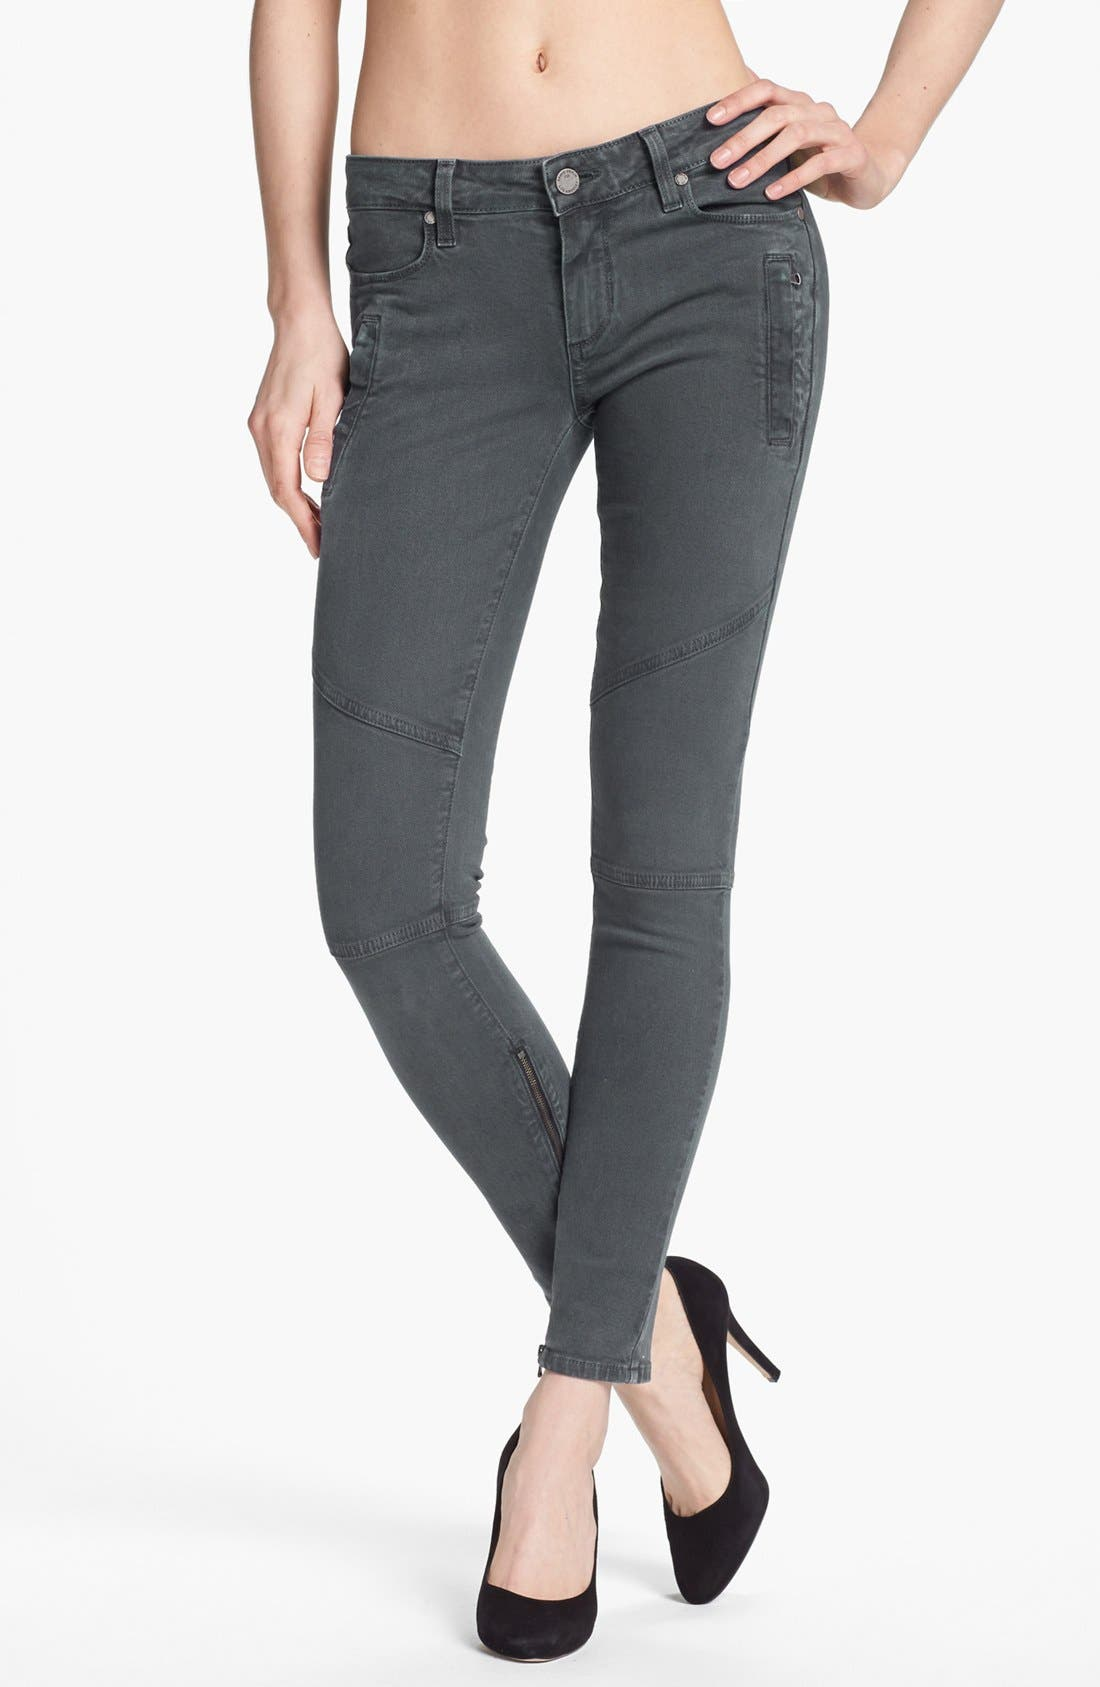 Alternate Image 1 Selected - Paige Denim 'Marley' Seam Detail Skinny Jeans (Black Current)